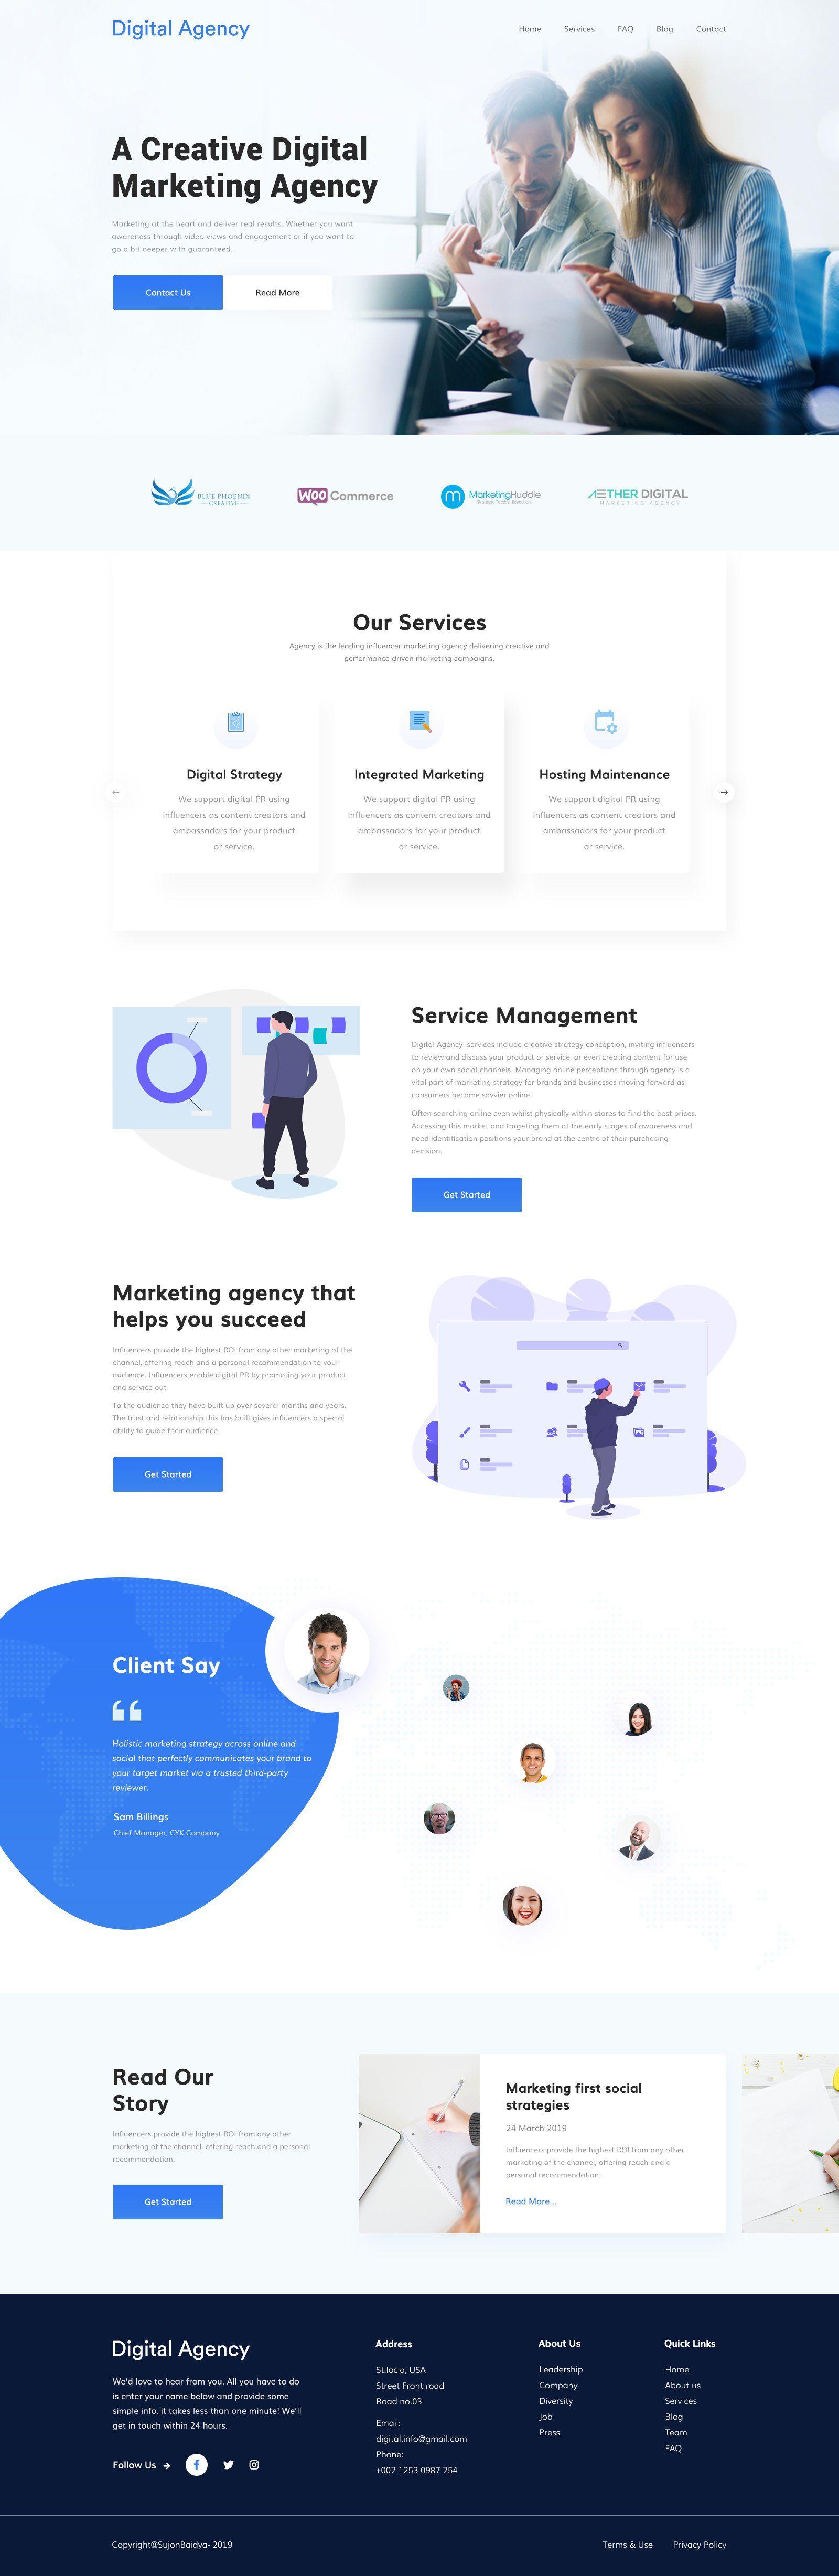 Digital Marketing Agency Corporate Web Design Corporate Website Design Modern Website Design